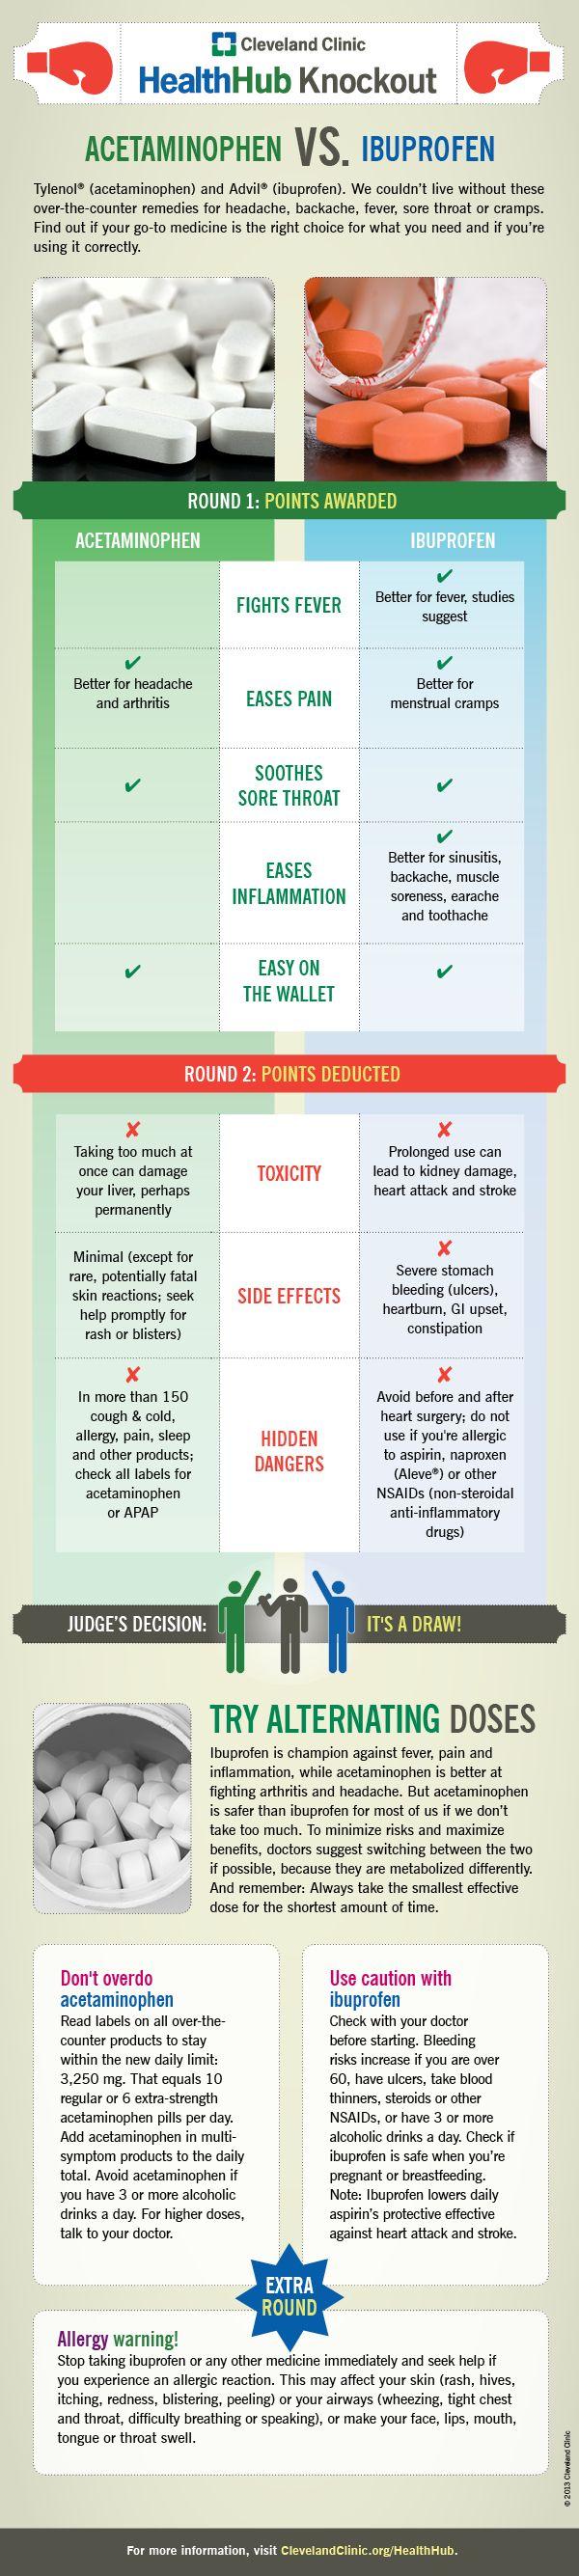 Tylenol vs. Advil  (Acetominphen vs. Ibuprophen)  #ClevelandClinic